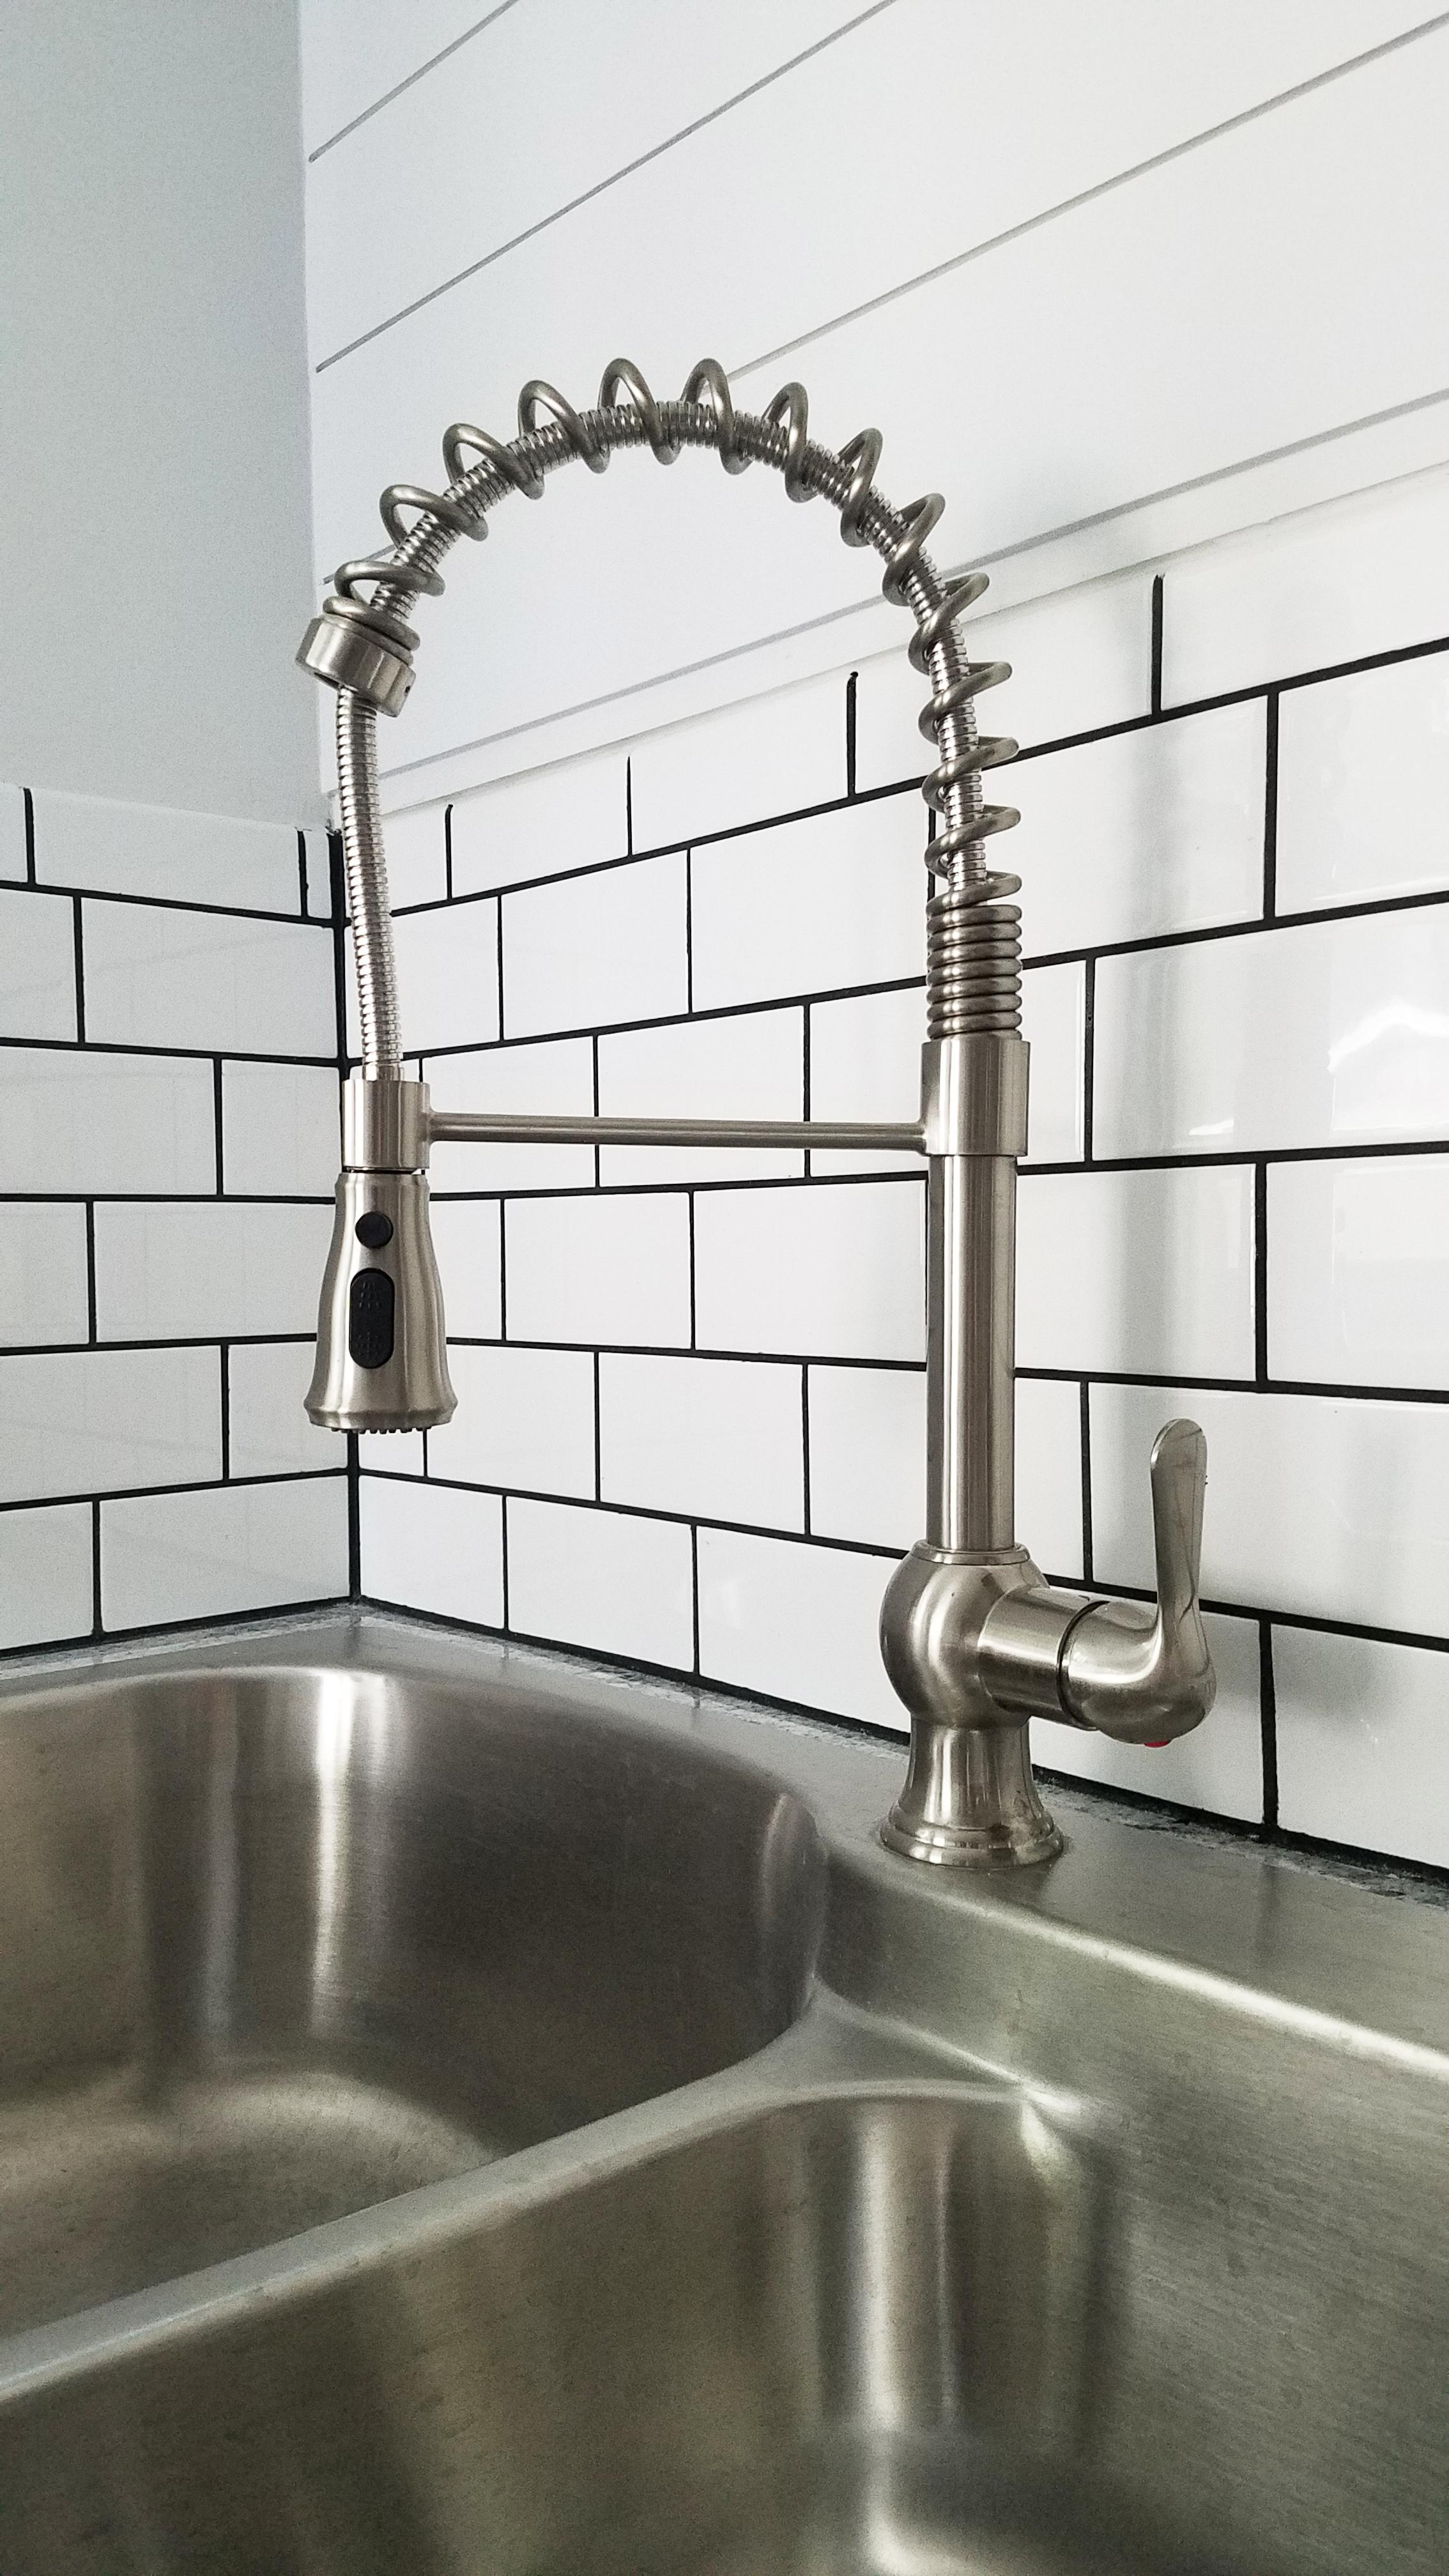 Haymount Homes Glenville House kitchen sink 2.jpg